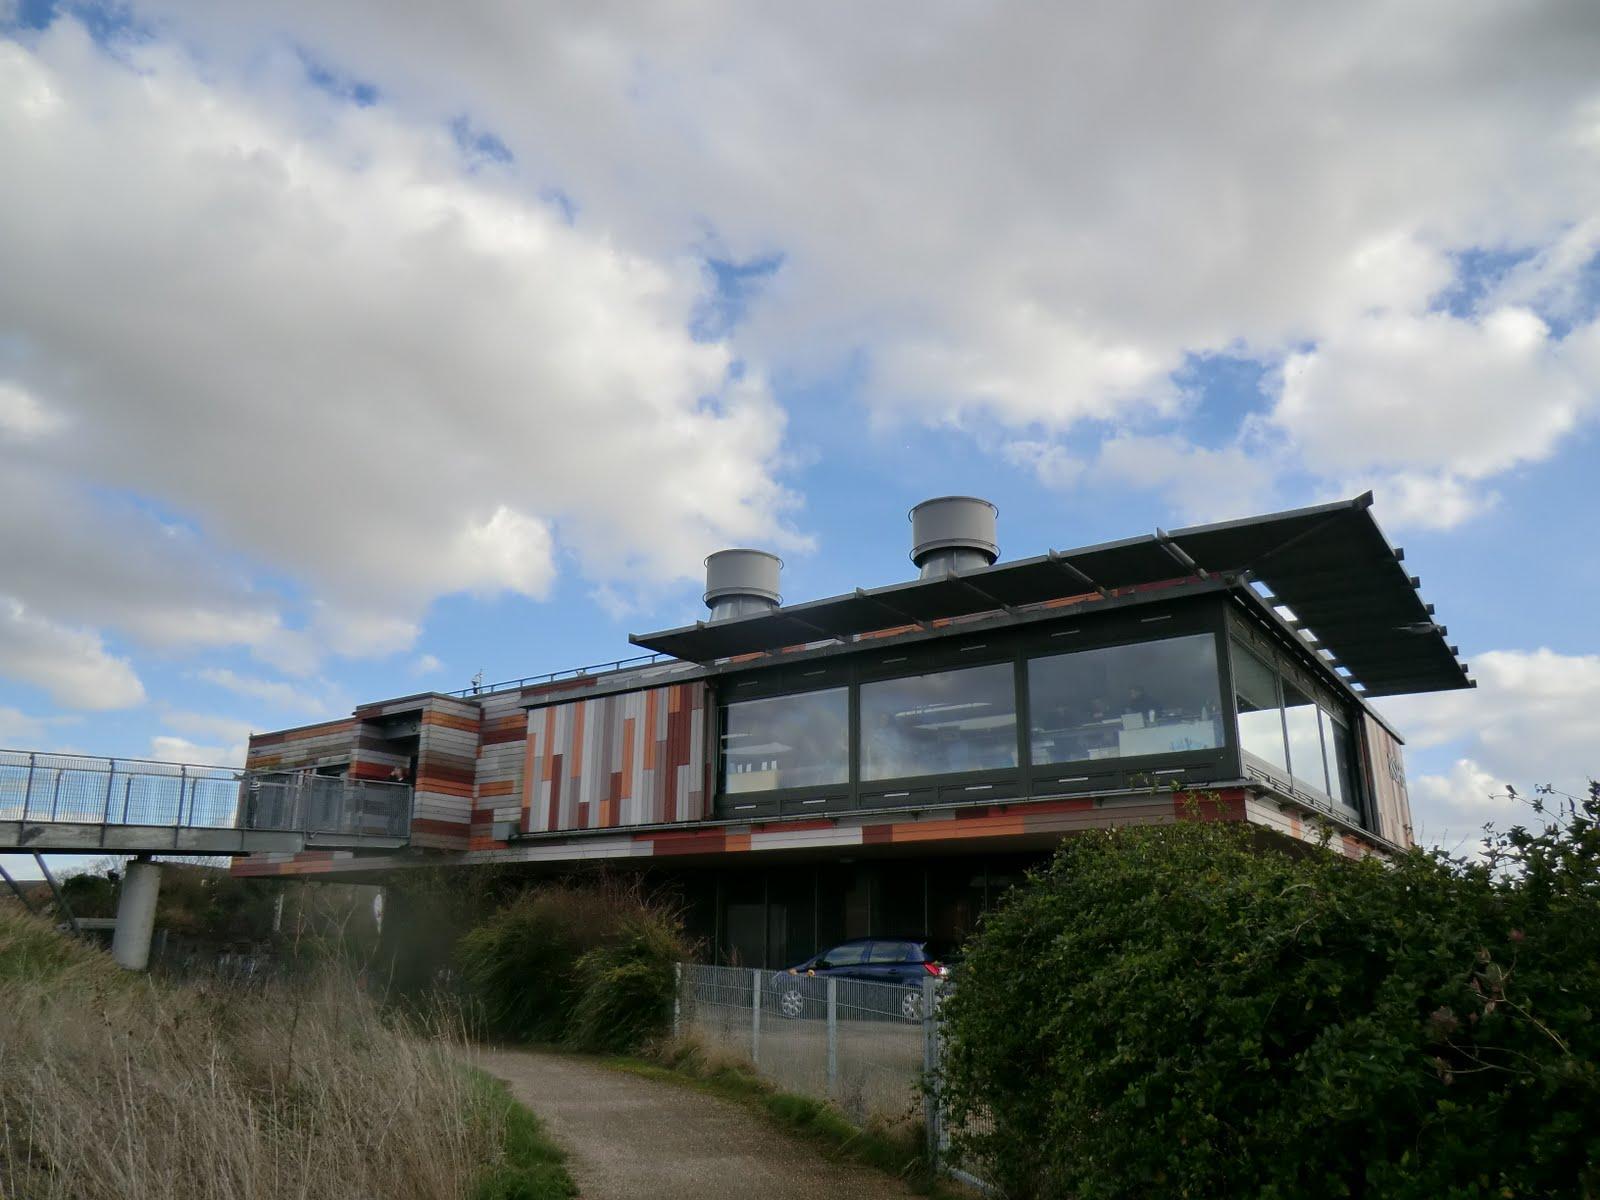 CIMG9961 RSPB Visitor Centre